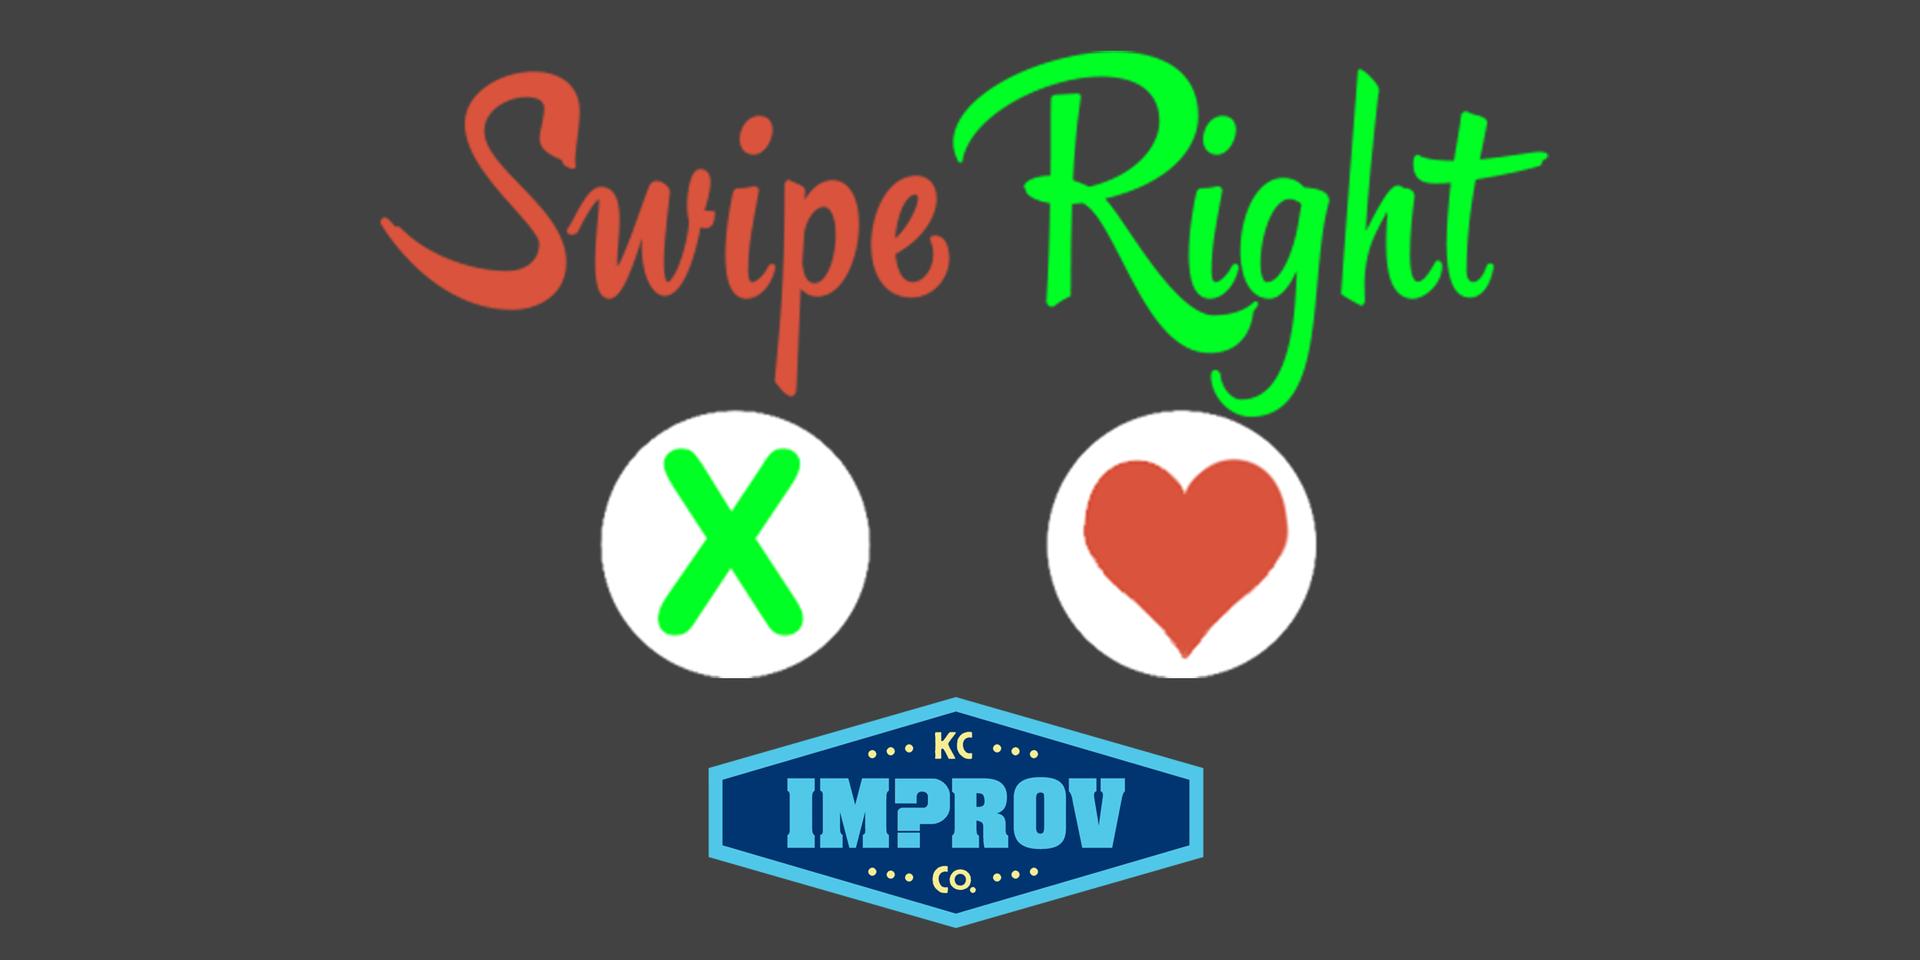 Swipe-Right-Eventbrite.png